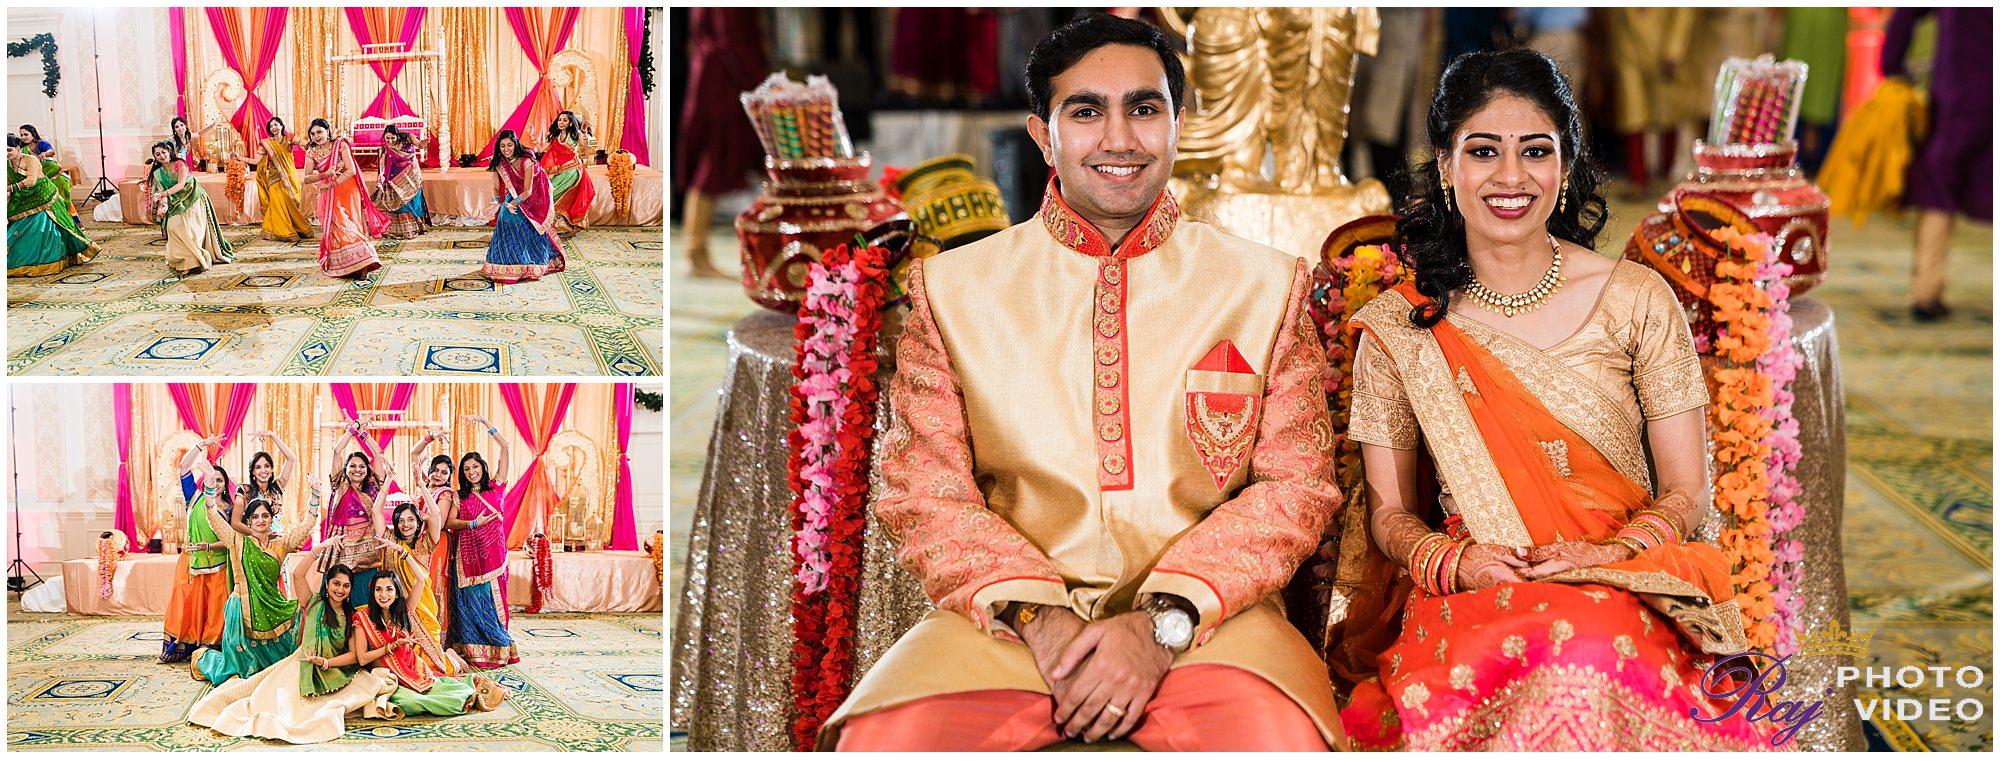 Founders-Inn-and-Spa-Virginia-Beach-VA-Indian-Wedding-Harini-Vivek-3.jpg